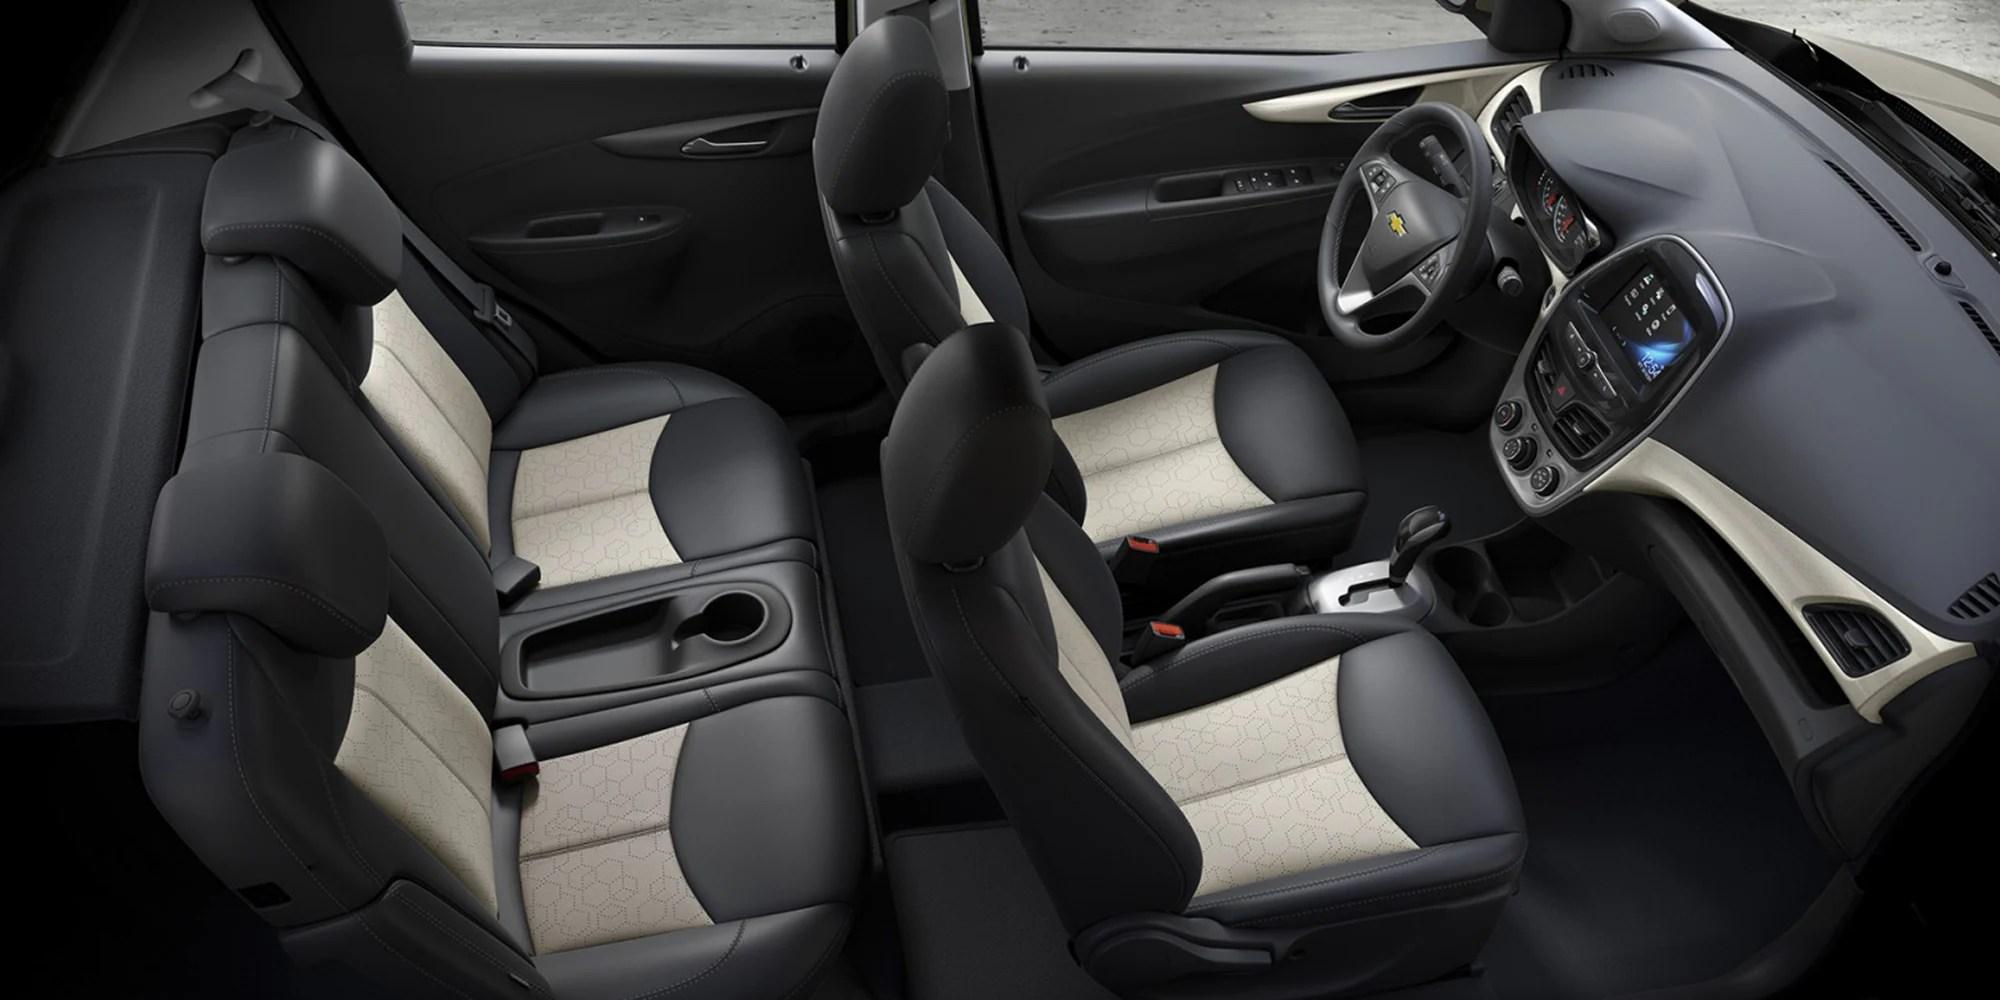 medium resolution of chevrolet 2018 spark city car design interior seats